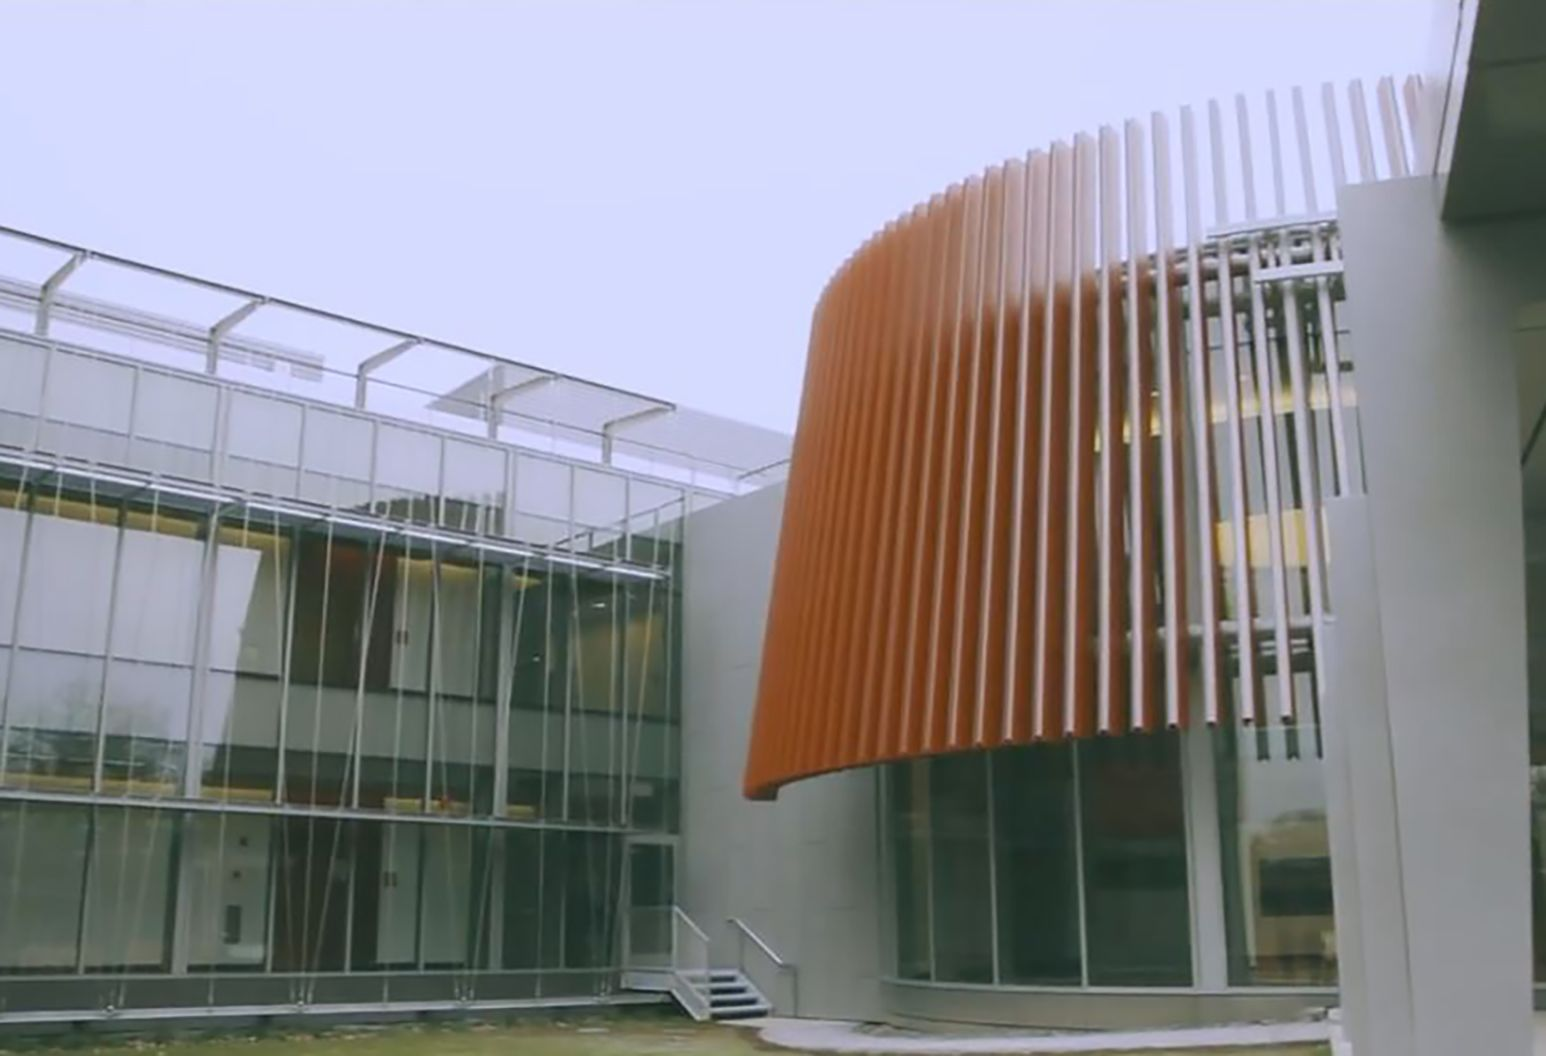 Exterior image of Behavioral Health Pavilion at Zucker Hillside Hospital